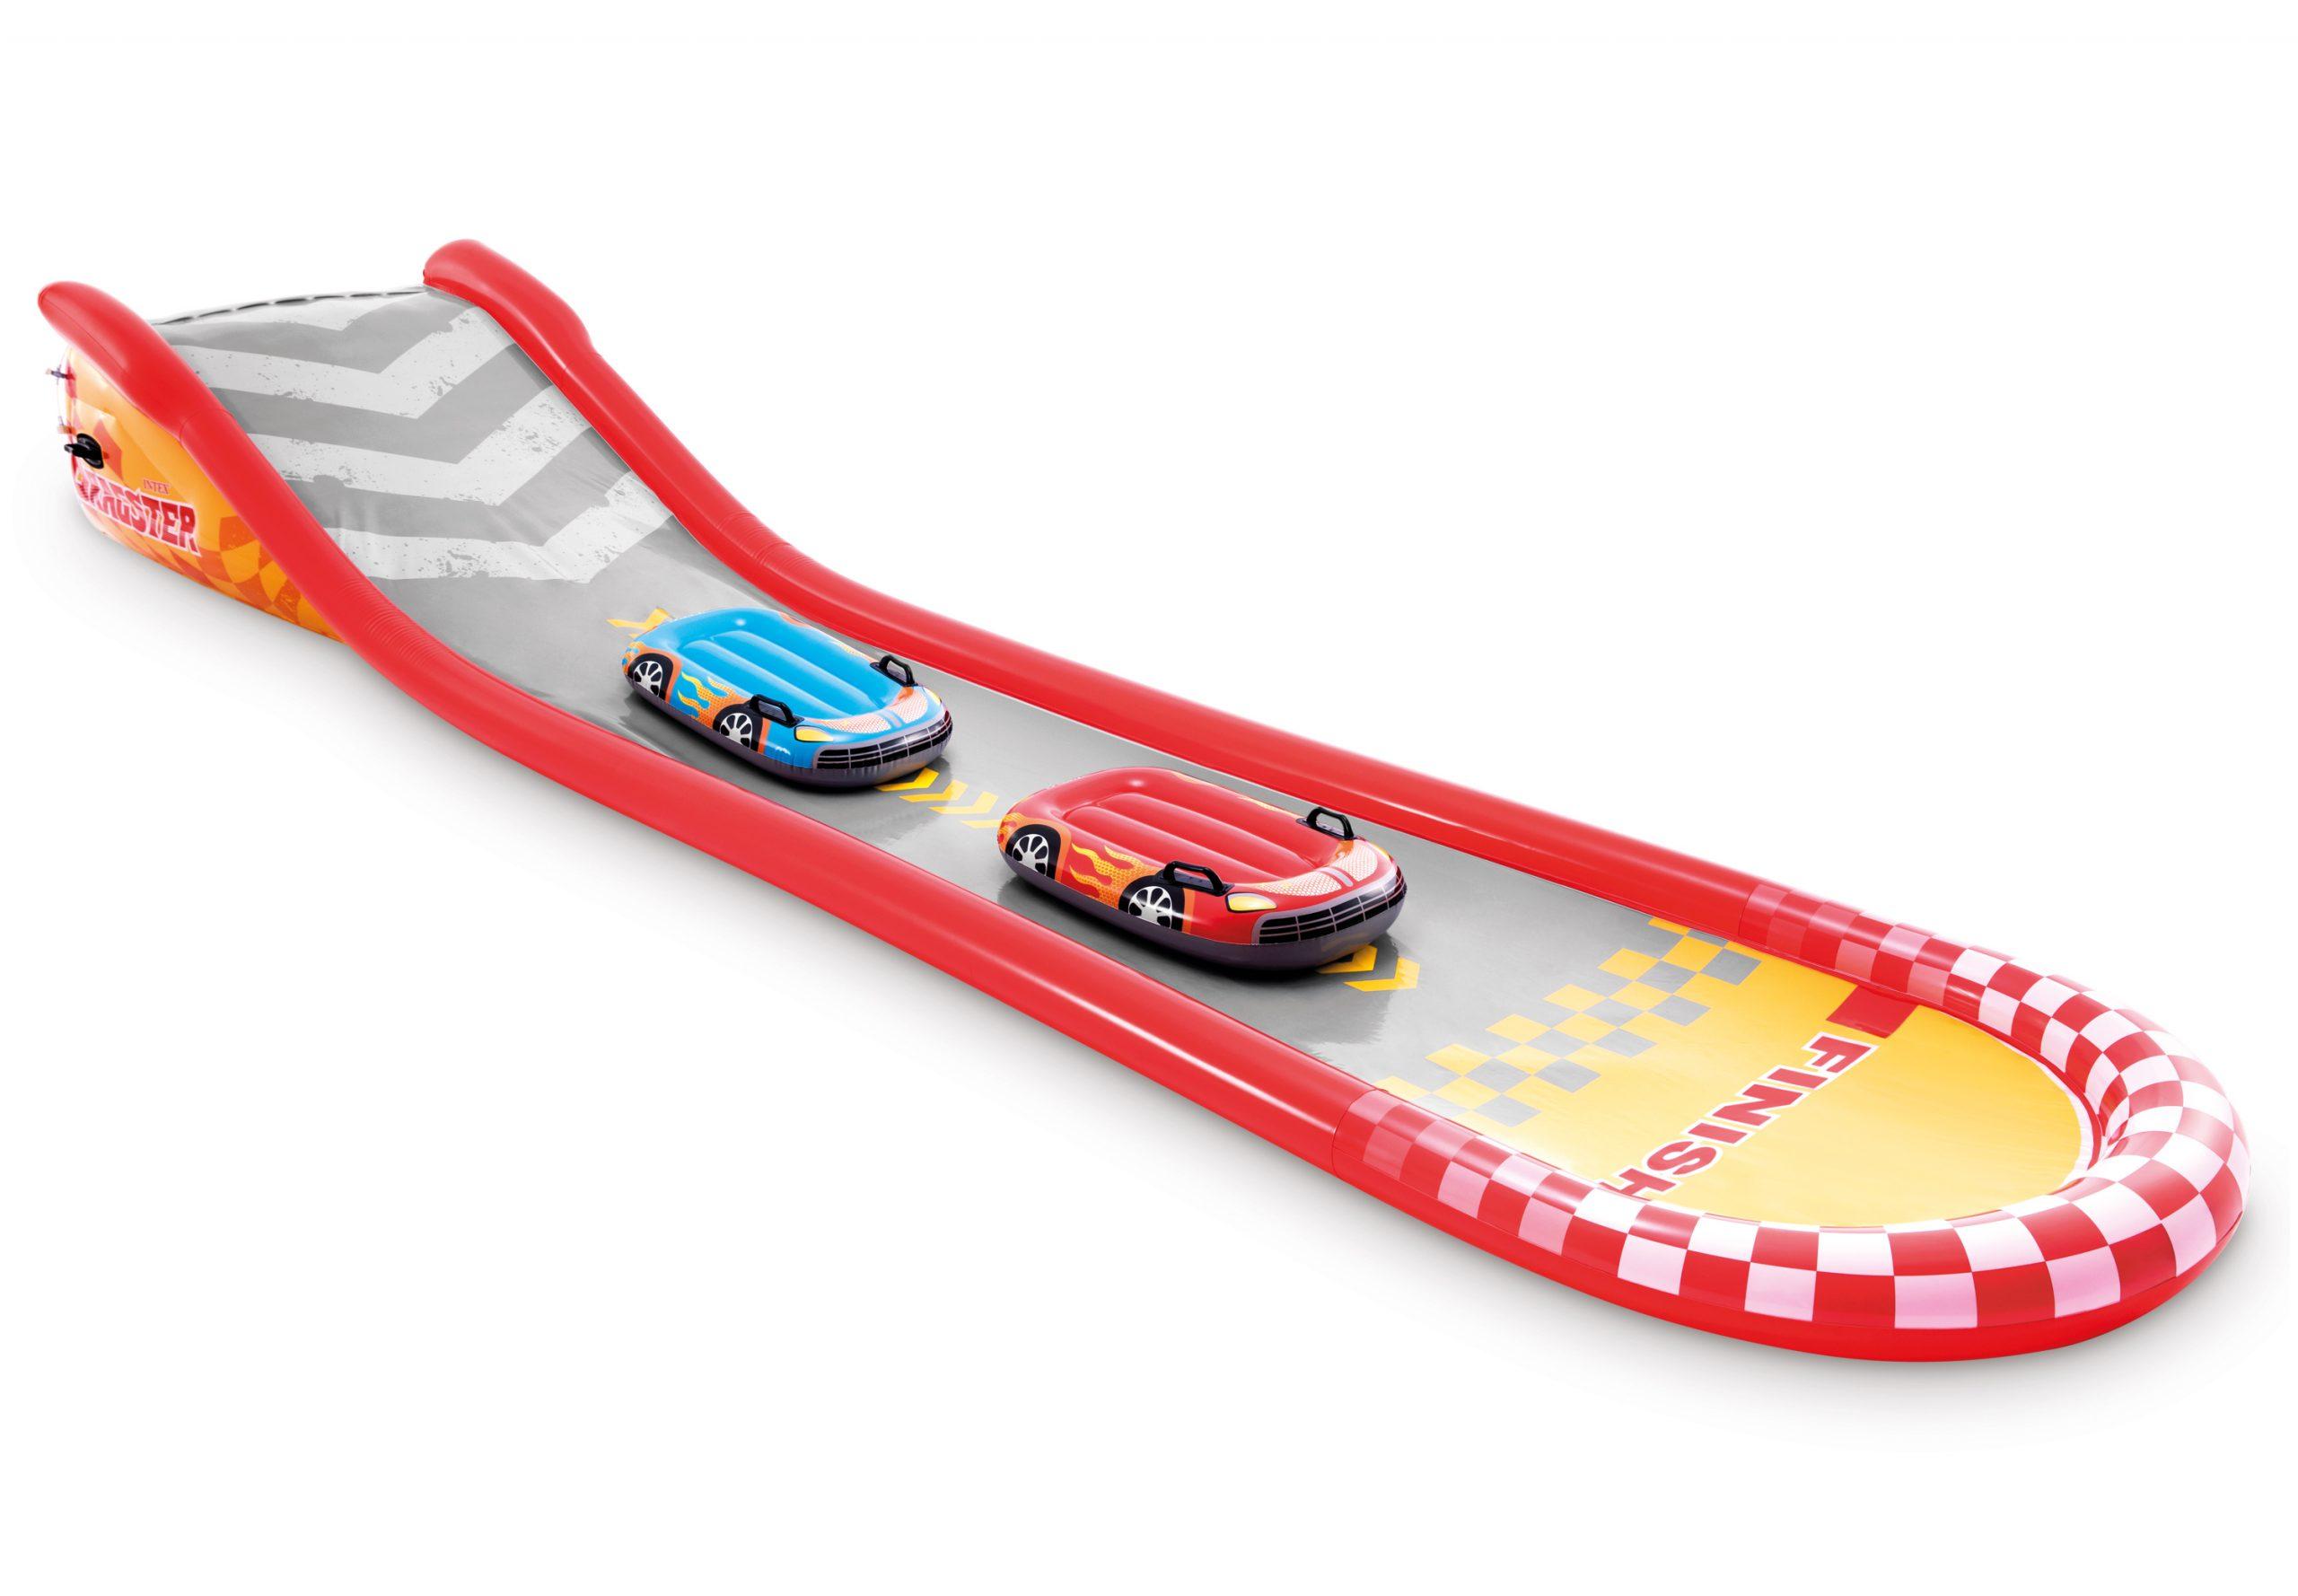 Scivolo racing fun cm 561x190x76 -